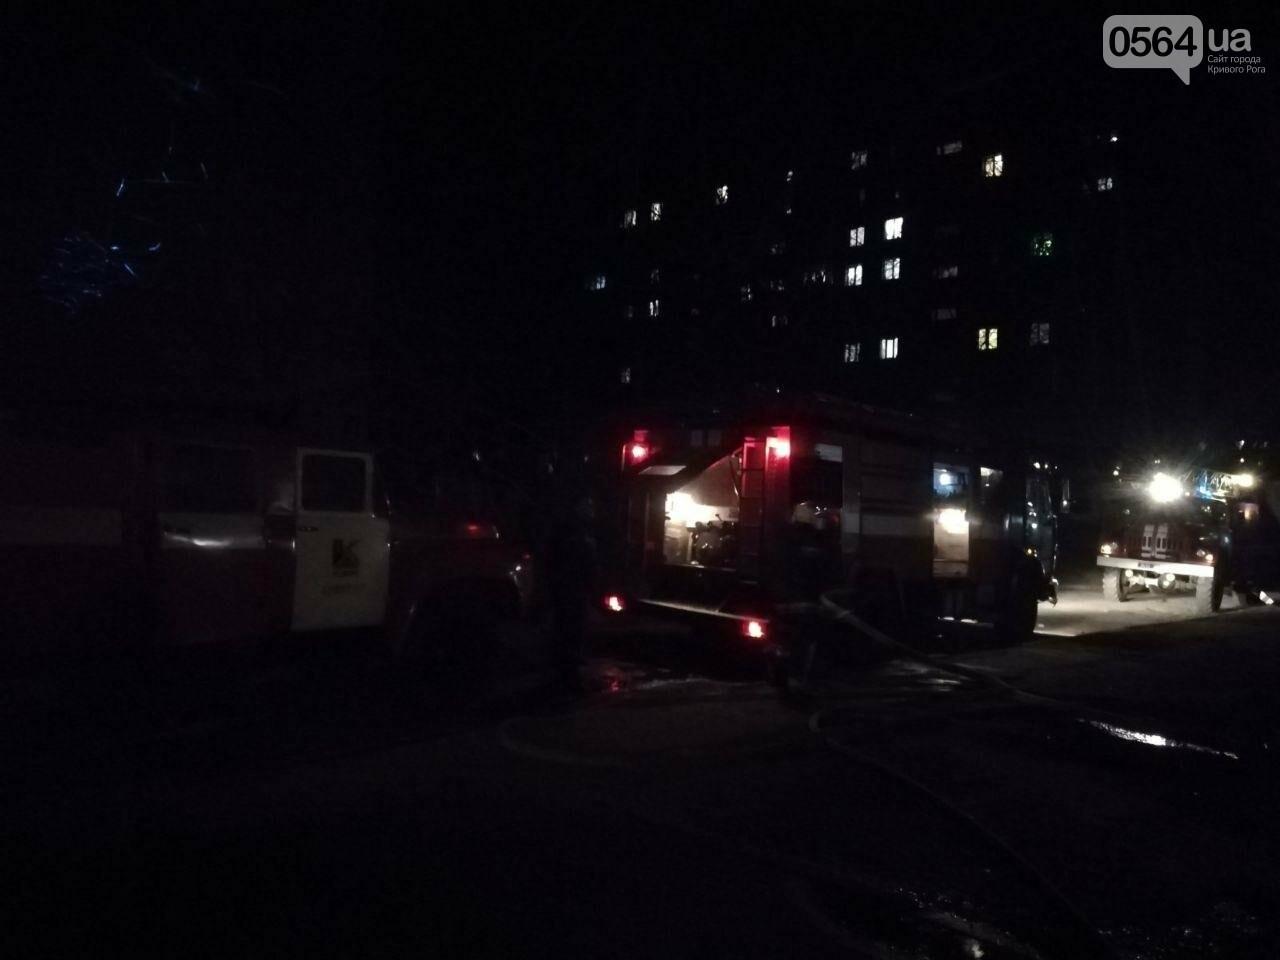 В Кривом Роге загорелась квартира на 6 этаже. Найдено тело мужчины, - ФОТО 18+, ВИДЕО, ОБНОВЛЕНО, фото-5